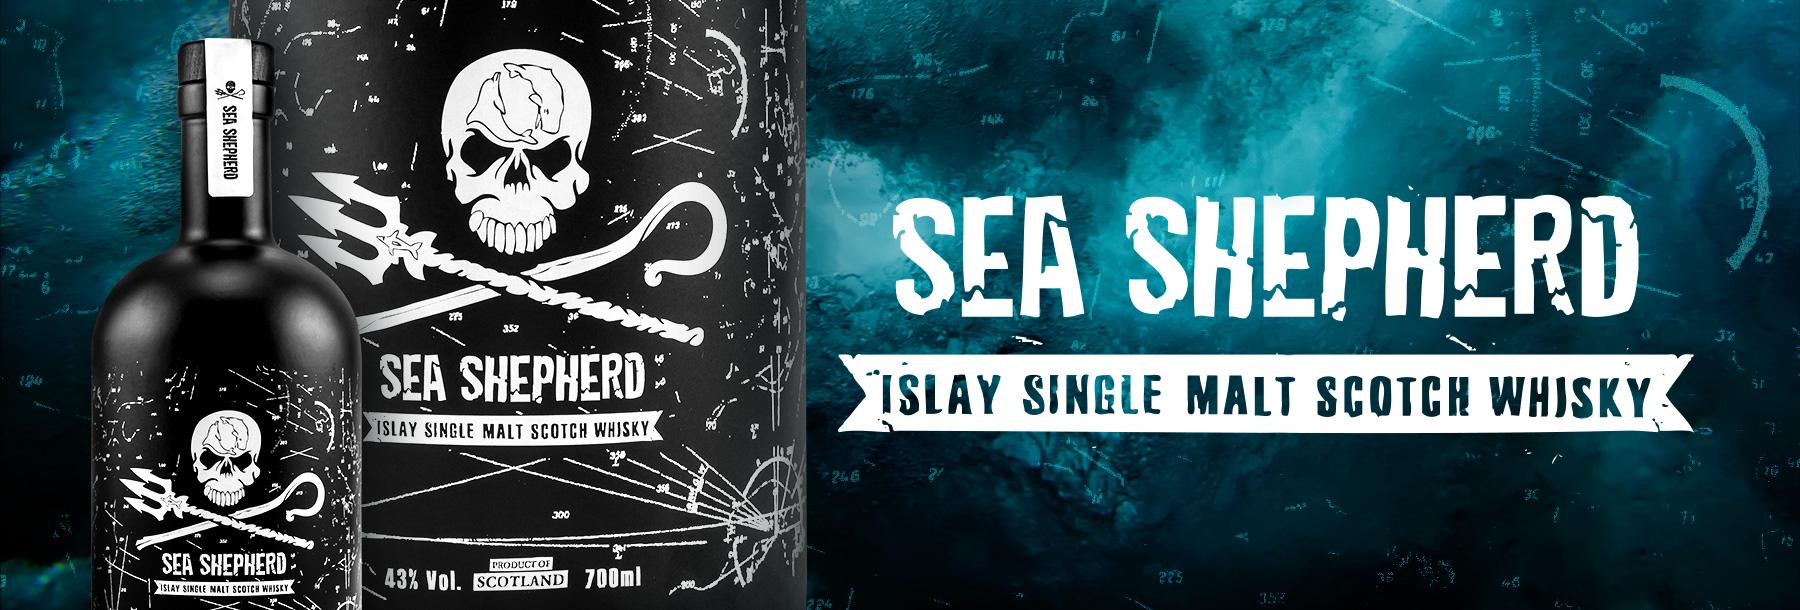 Sea Shepherd Islay Single Malt Scotch Whisky